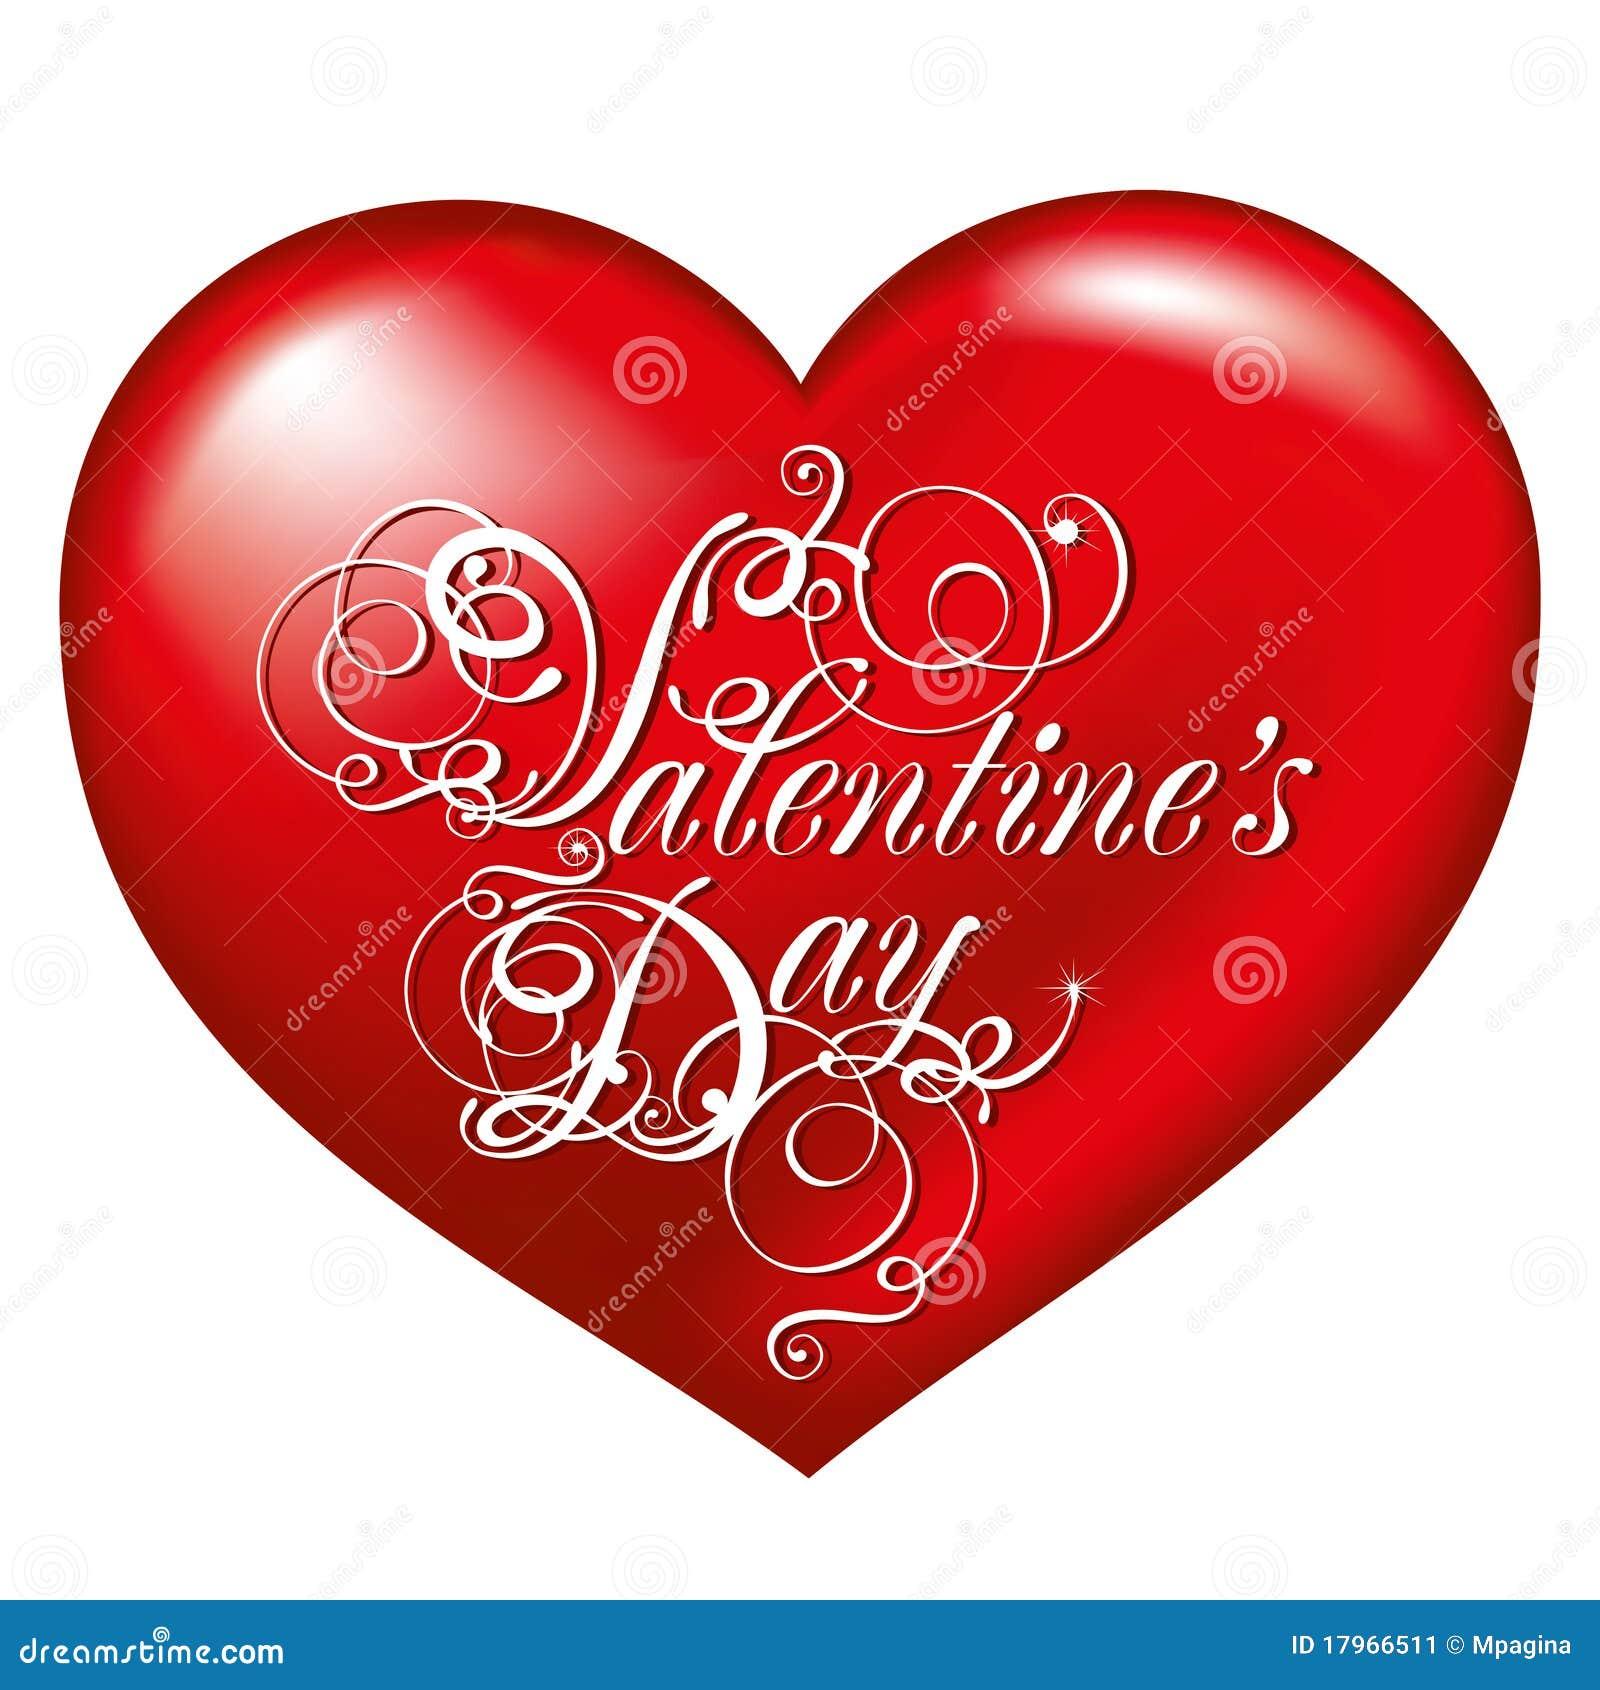 coeur rouge symbole de l 39 amour image stock image 17966511. Black Bedroom Furniture Sets. Home Design Ideas